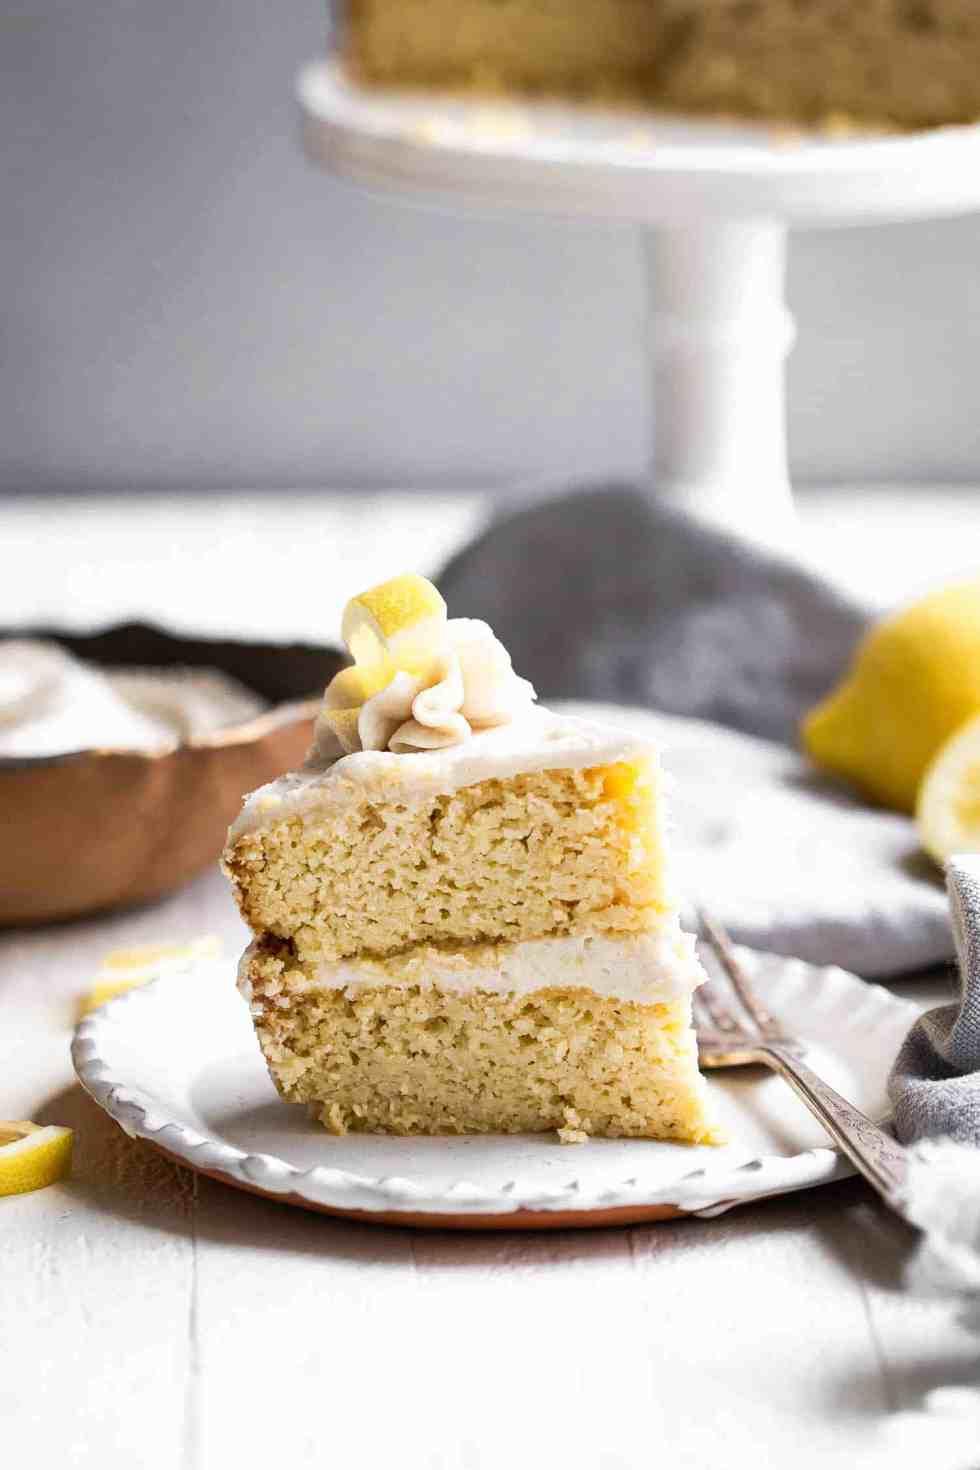 sugar free lemon cake slice on a white plate